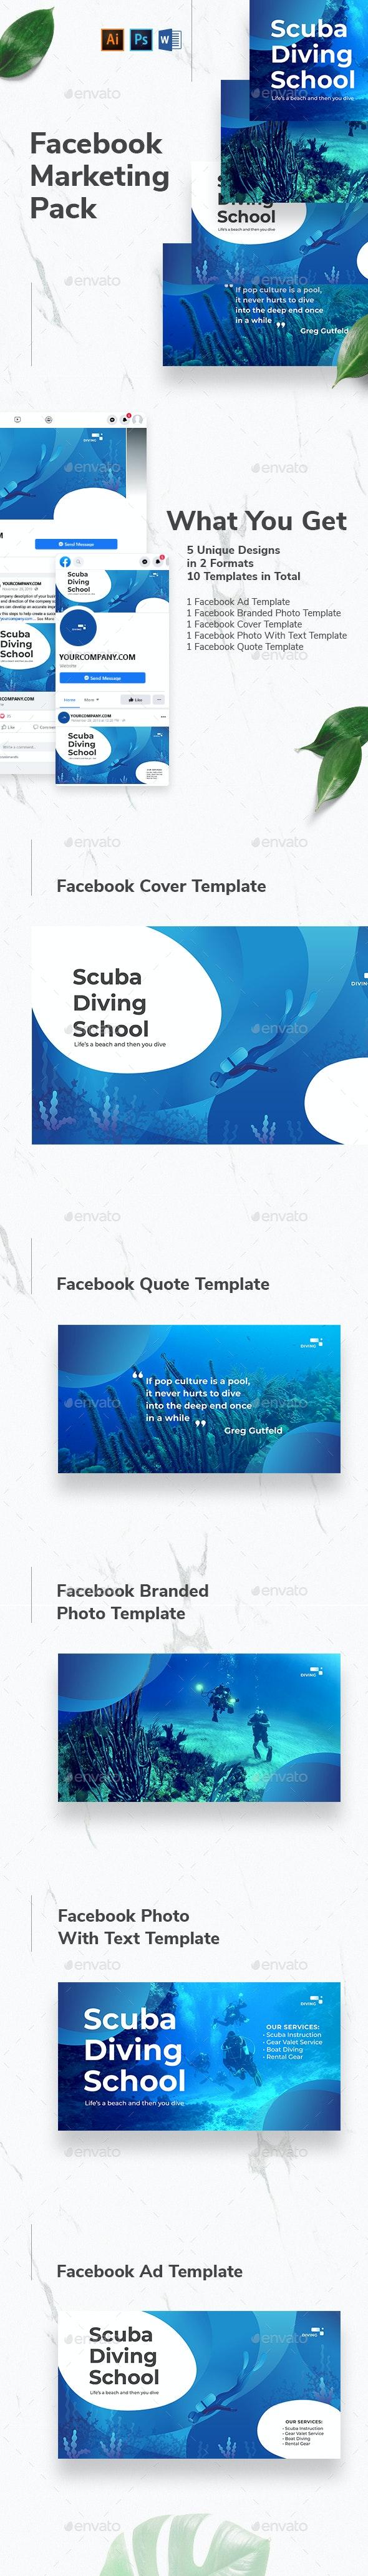 Diving School Facebook Marketing Materials - Facebook Timeline Covers Social Media